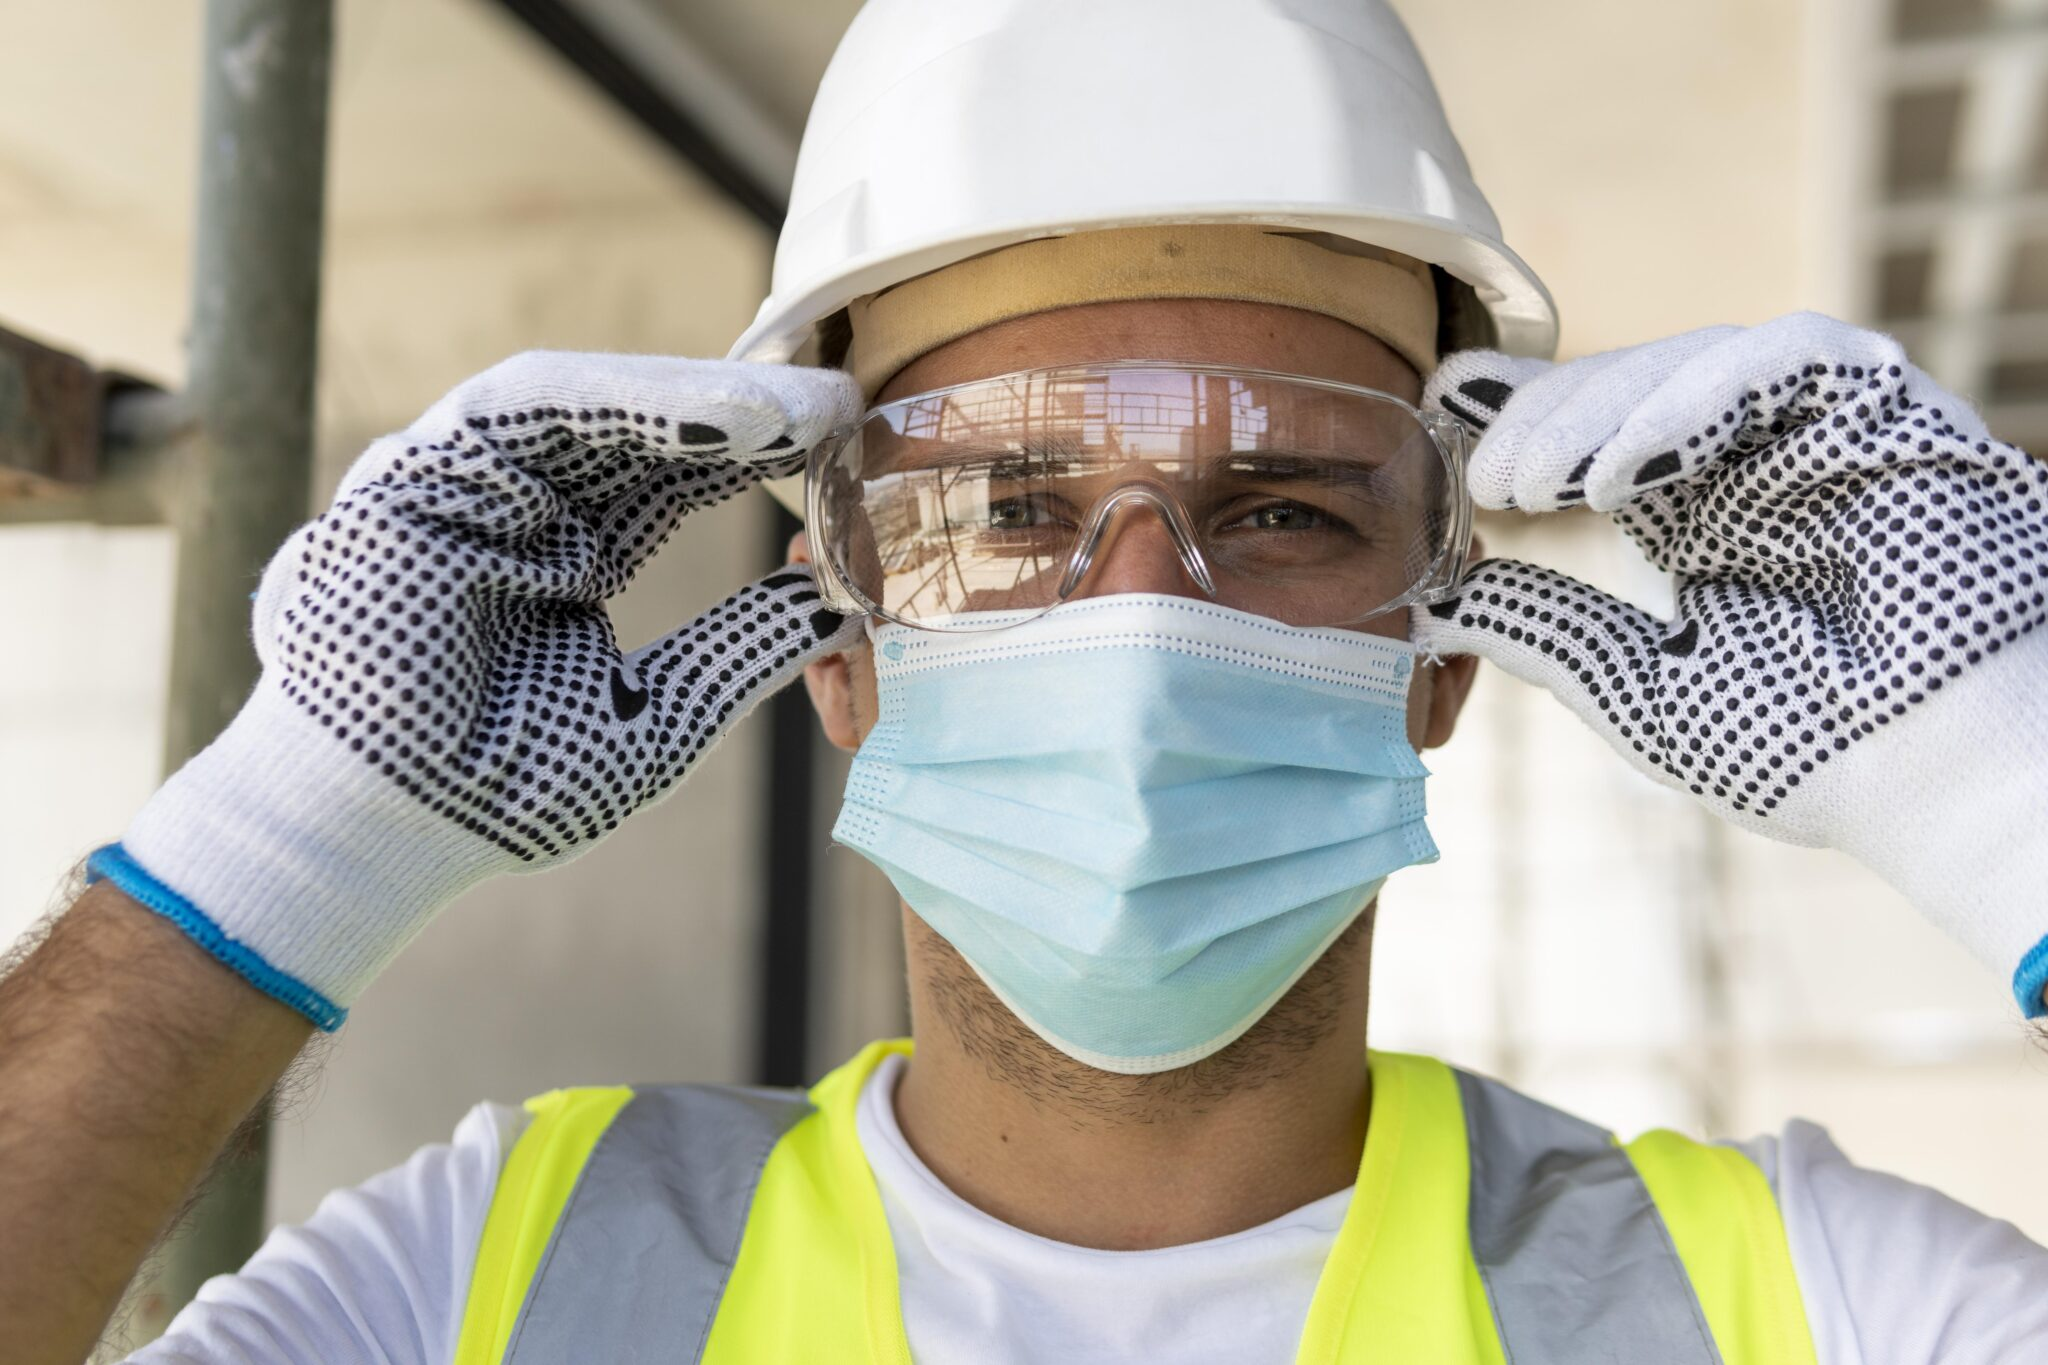 ¿Usar sobregafas o gafas de protección graduadas?